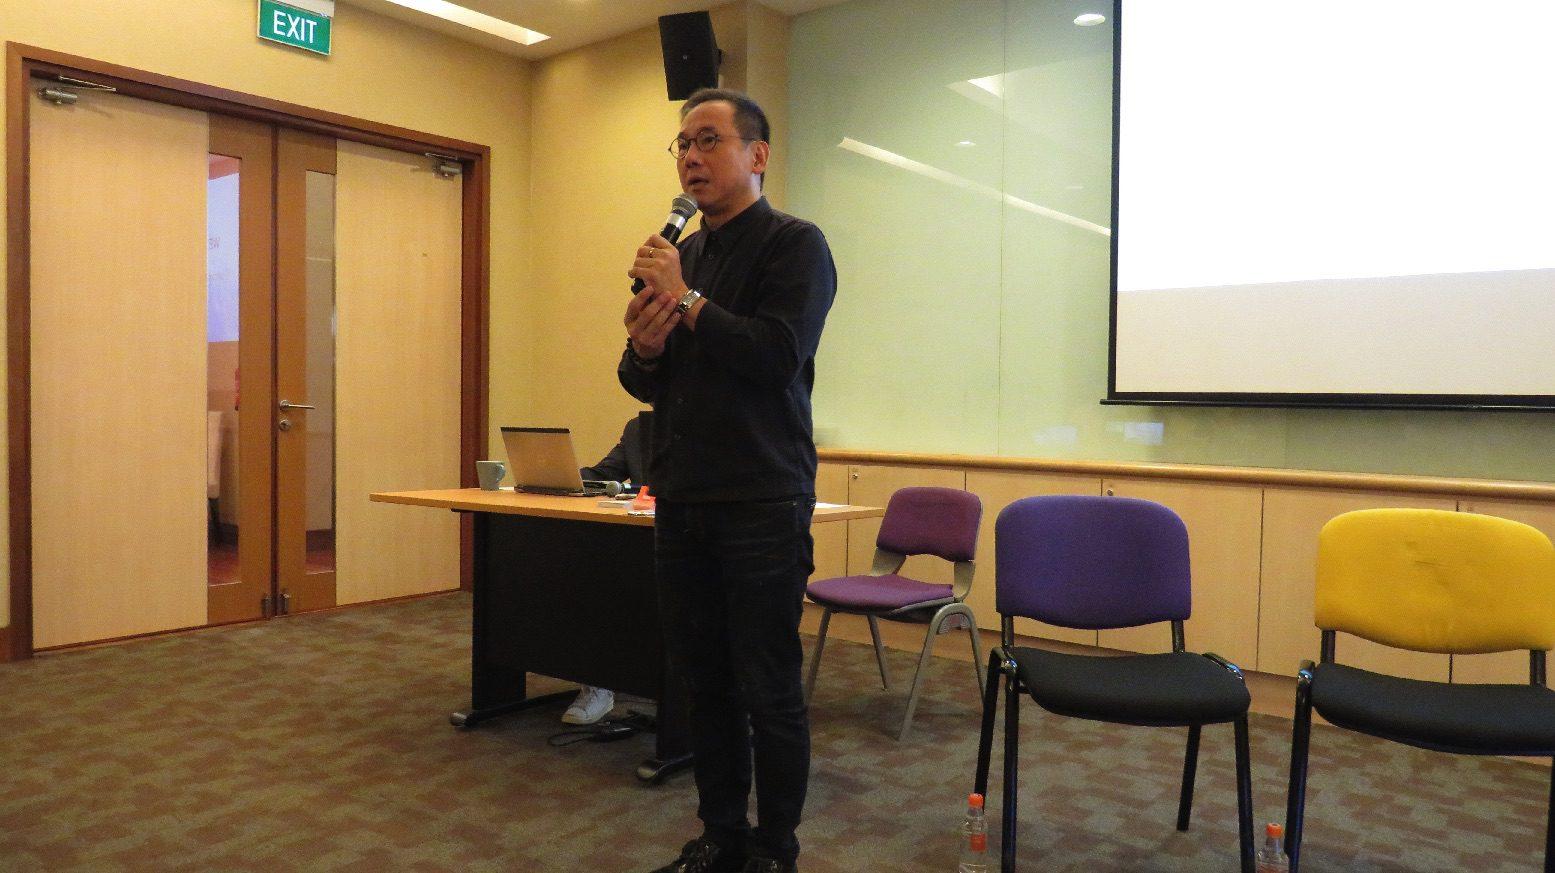 Daniel Yun, founder of Blue3 Asia.